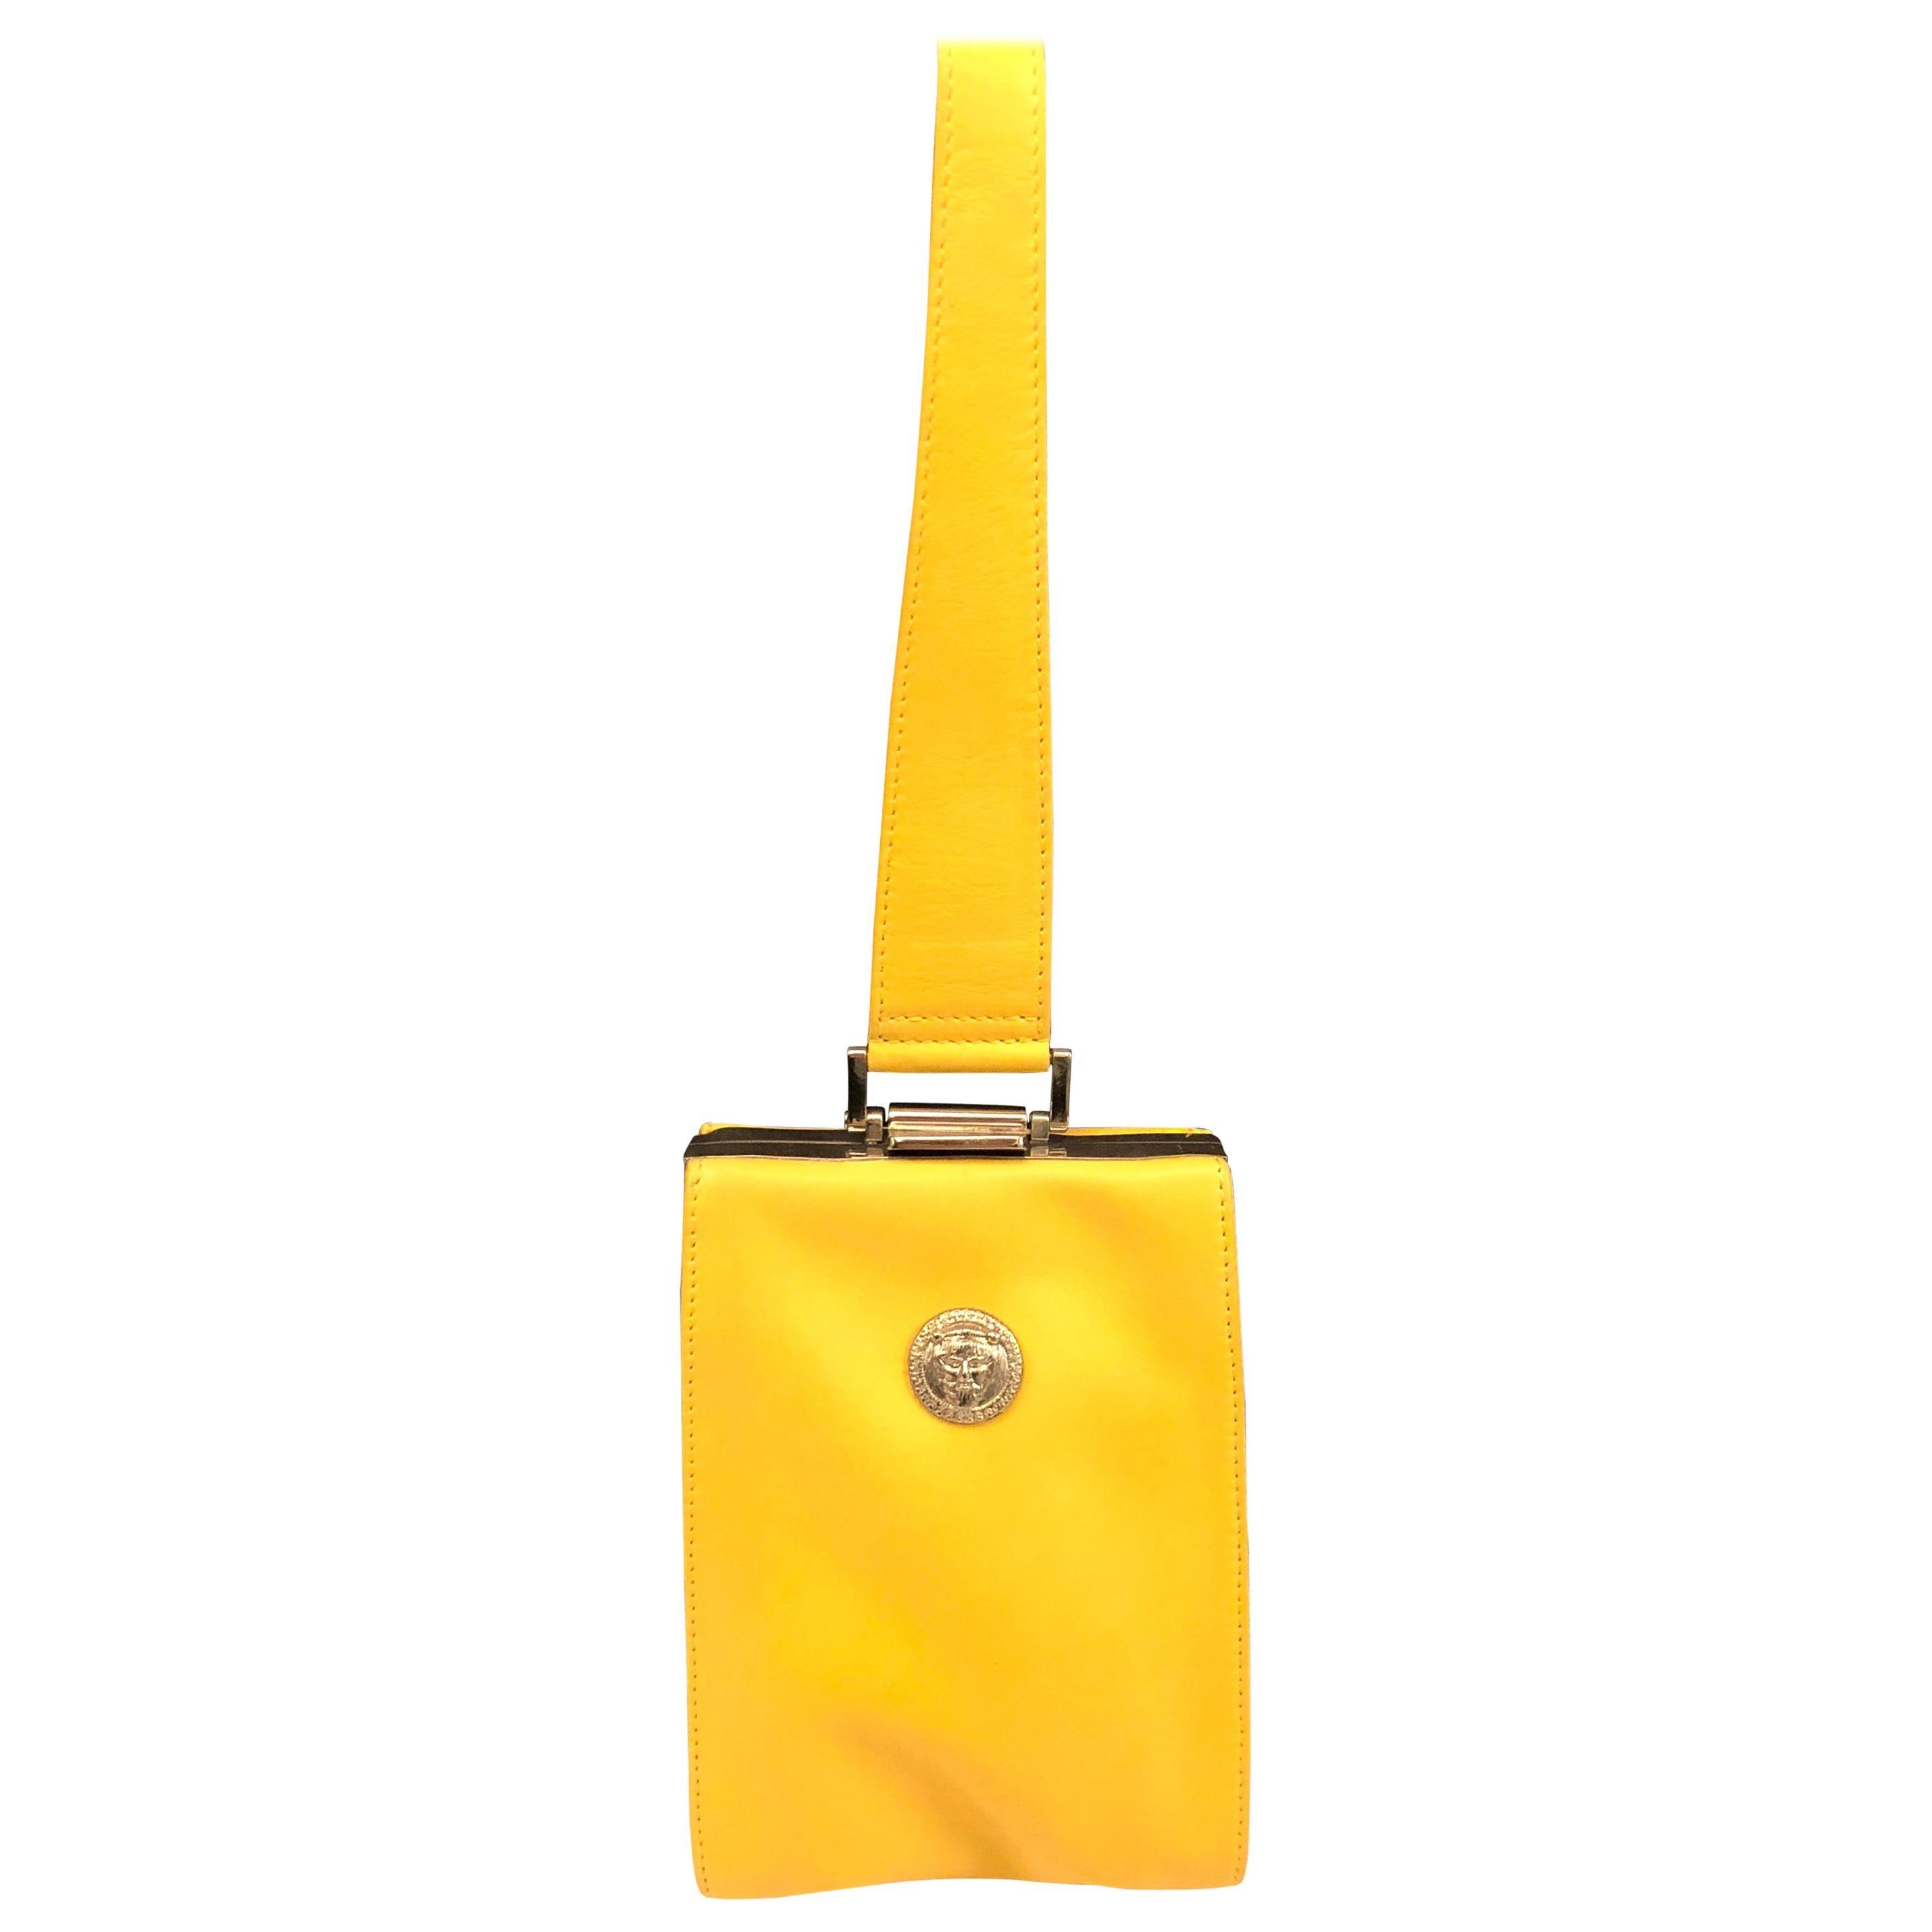 Istante by Gianni Versace yellow lambskin handbag